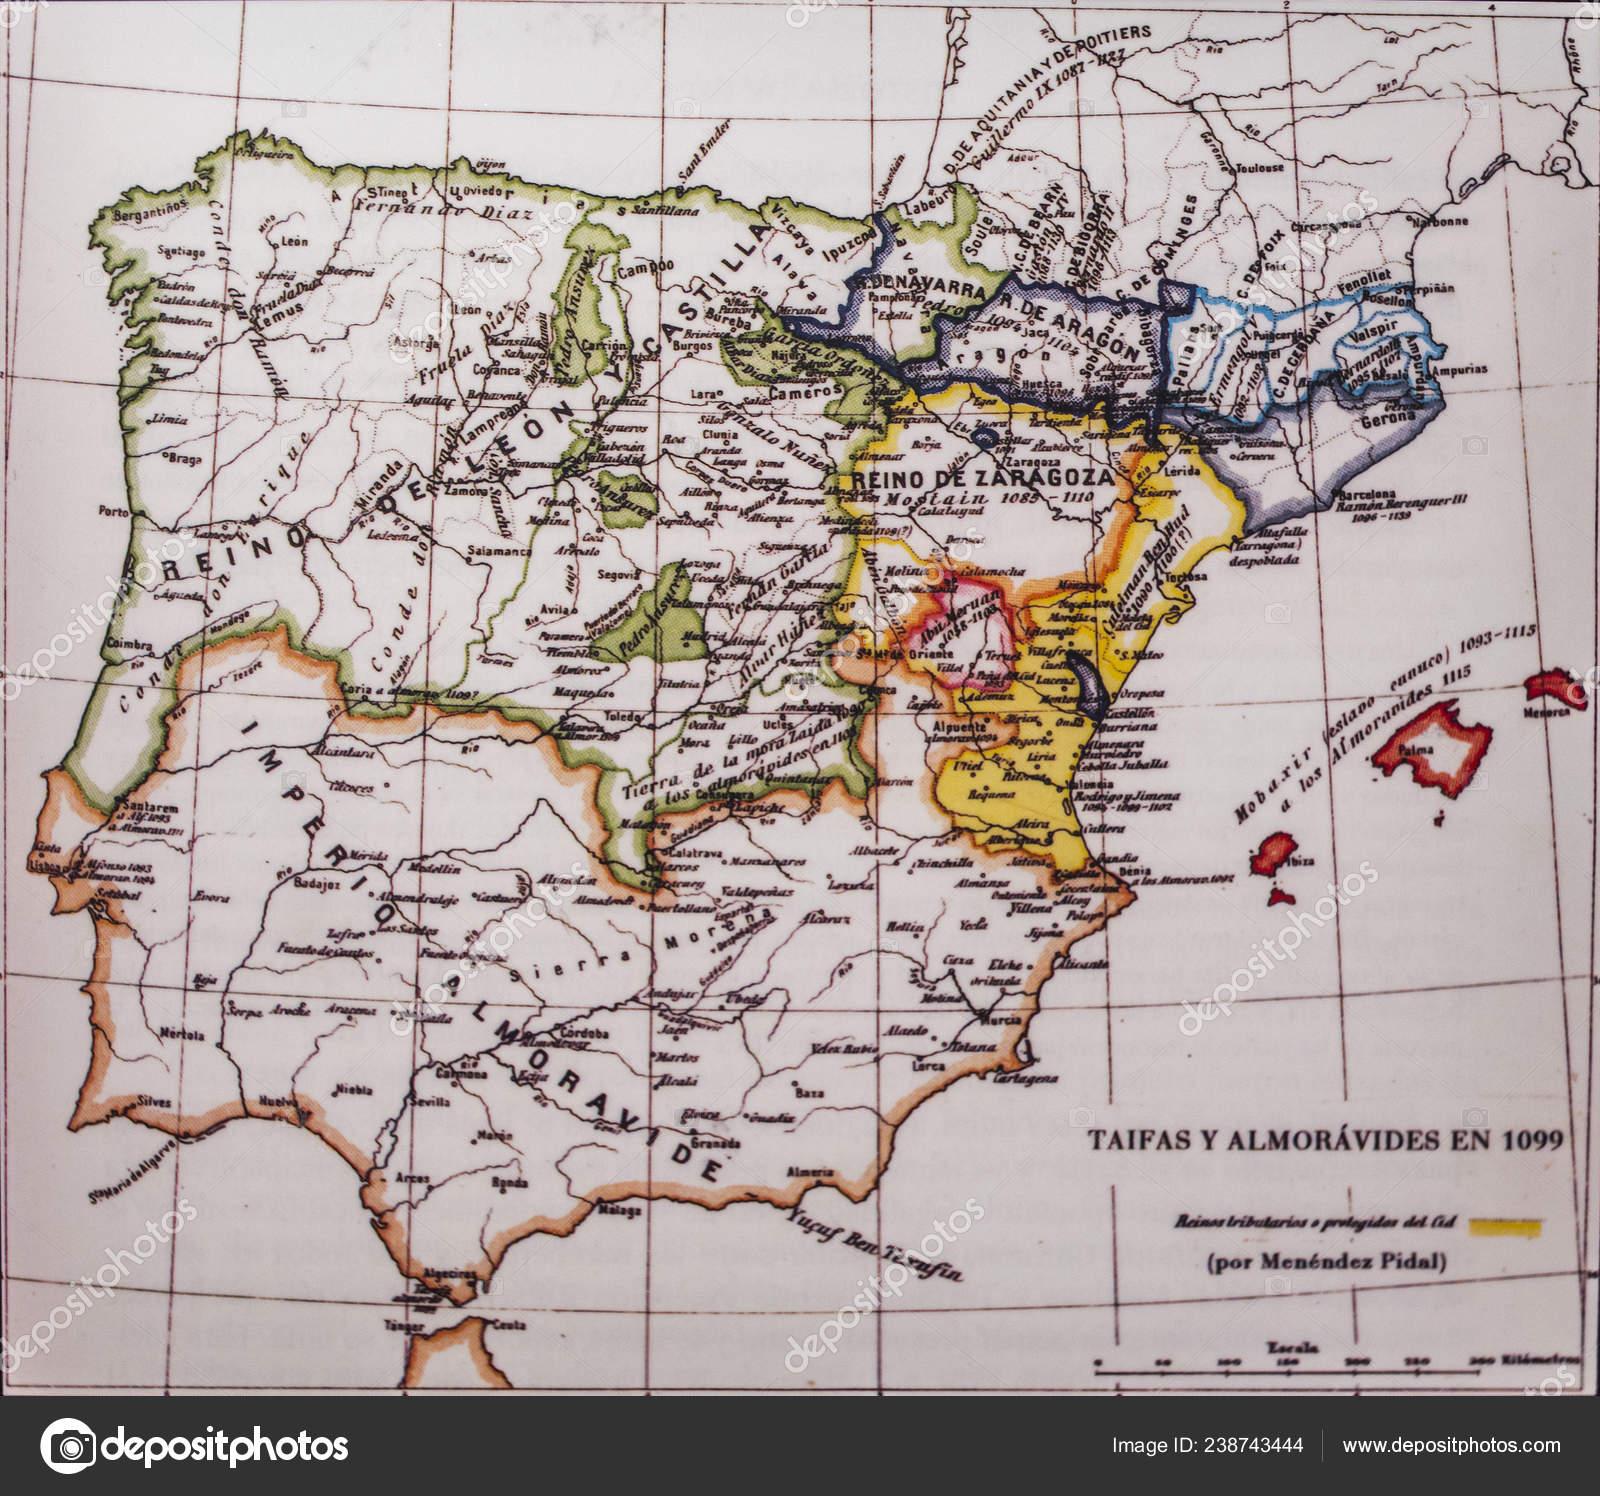 Badajoz Spain Dic 19Th 2018 Iberian Peninsula 1099 Map ... on jutland on map, al-andalus on map, tagus on map, katla volcano on map, cape trafalgar on map, empire on map, hungary on map, brazilian highlands on map, benelux on map, mediterranean sea on map, yucatan peninsula on map, alps on map, sahara desert on world map, volga river on map, kamchatka peninsula on map, european plain on map, philippines on map, river thames on map, italian peninsula on map, europe on map,